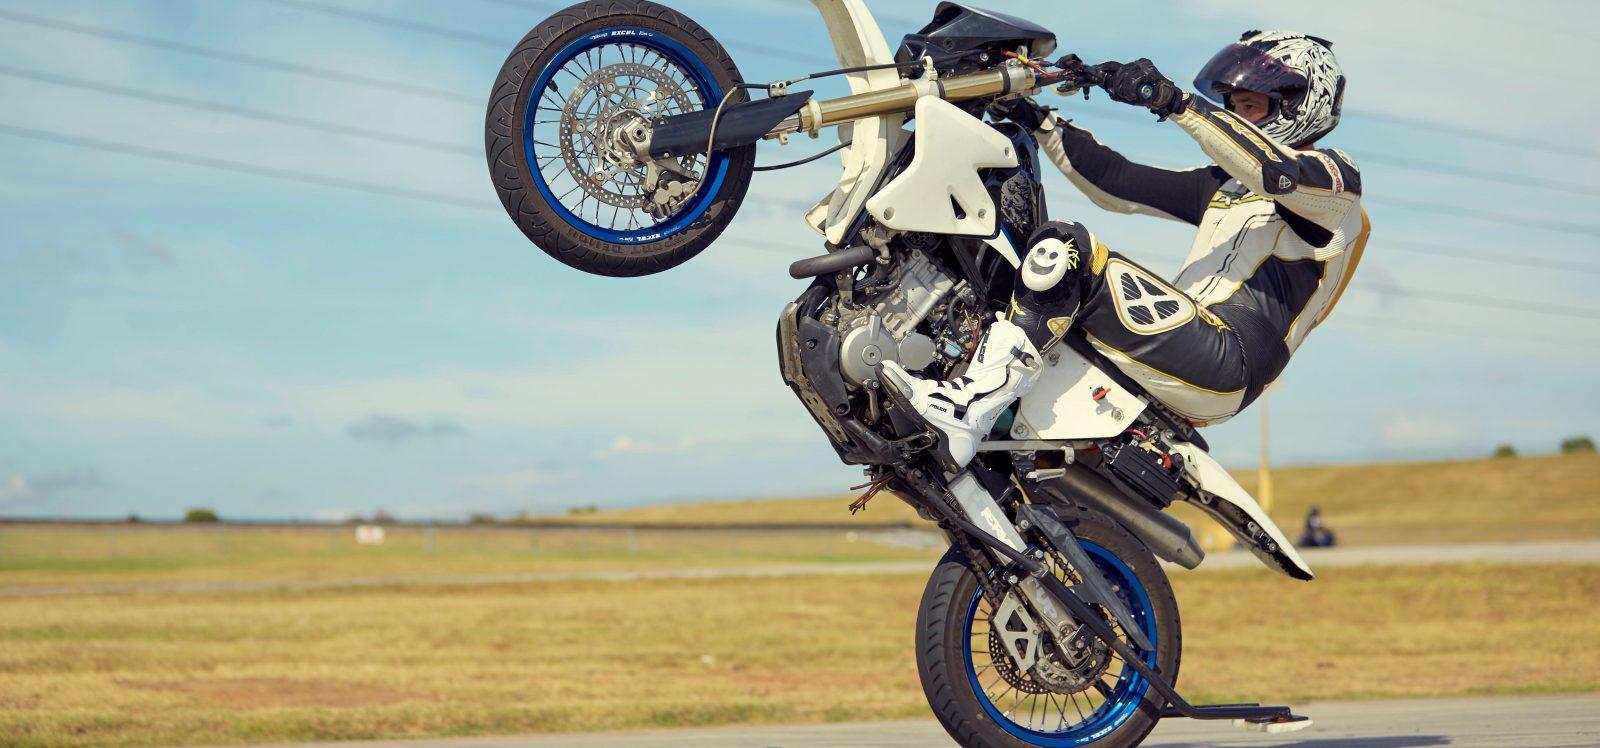 WHEELIEZONE WHEELIE SCHOOL - Australian Motorcycle News